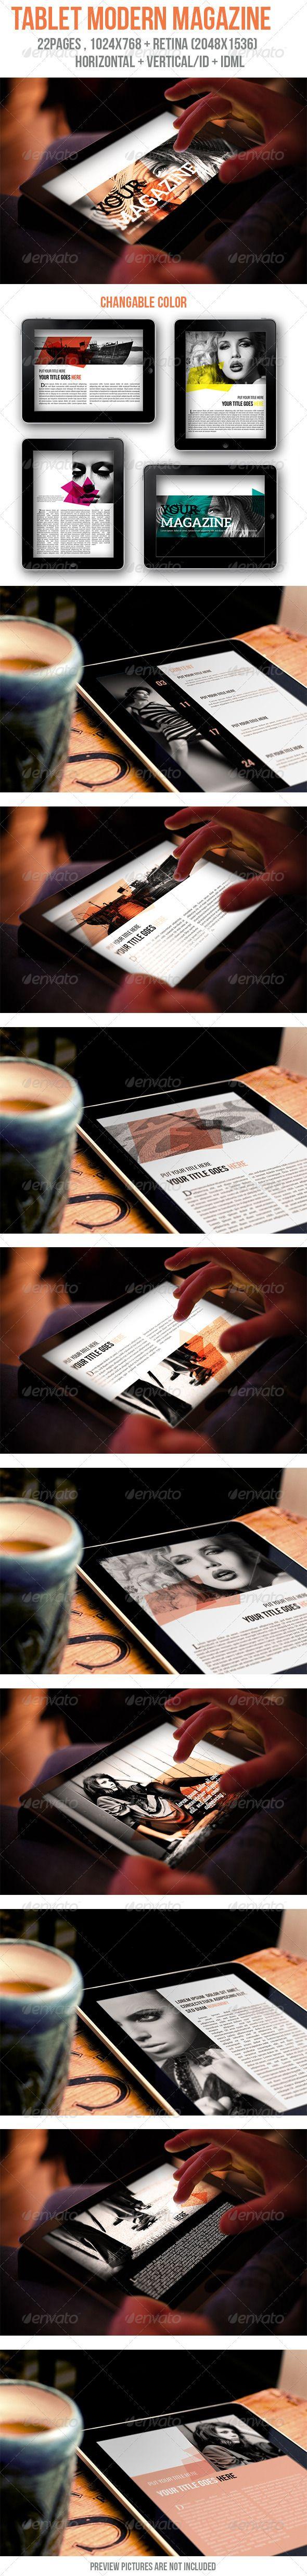 iPad & Tablet Modern Magazine Template #design Download: http://graphicriver.net/item/ipad-tablet-modern-magazine/6006075?ref=ksioks